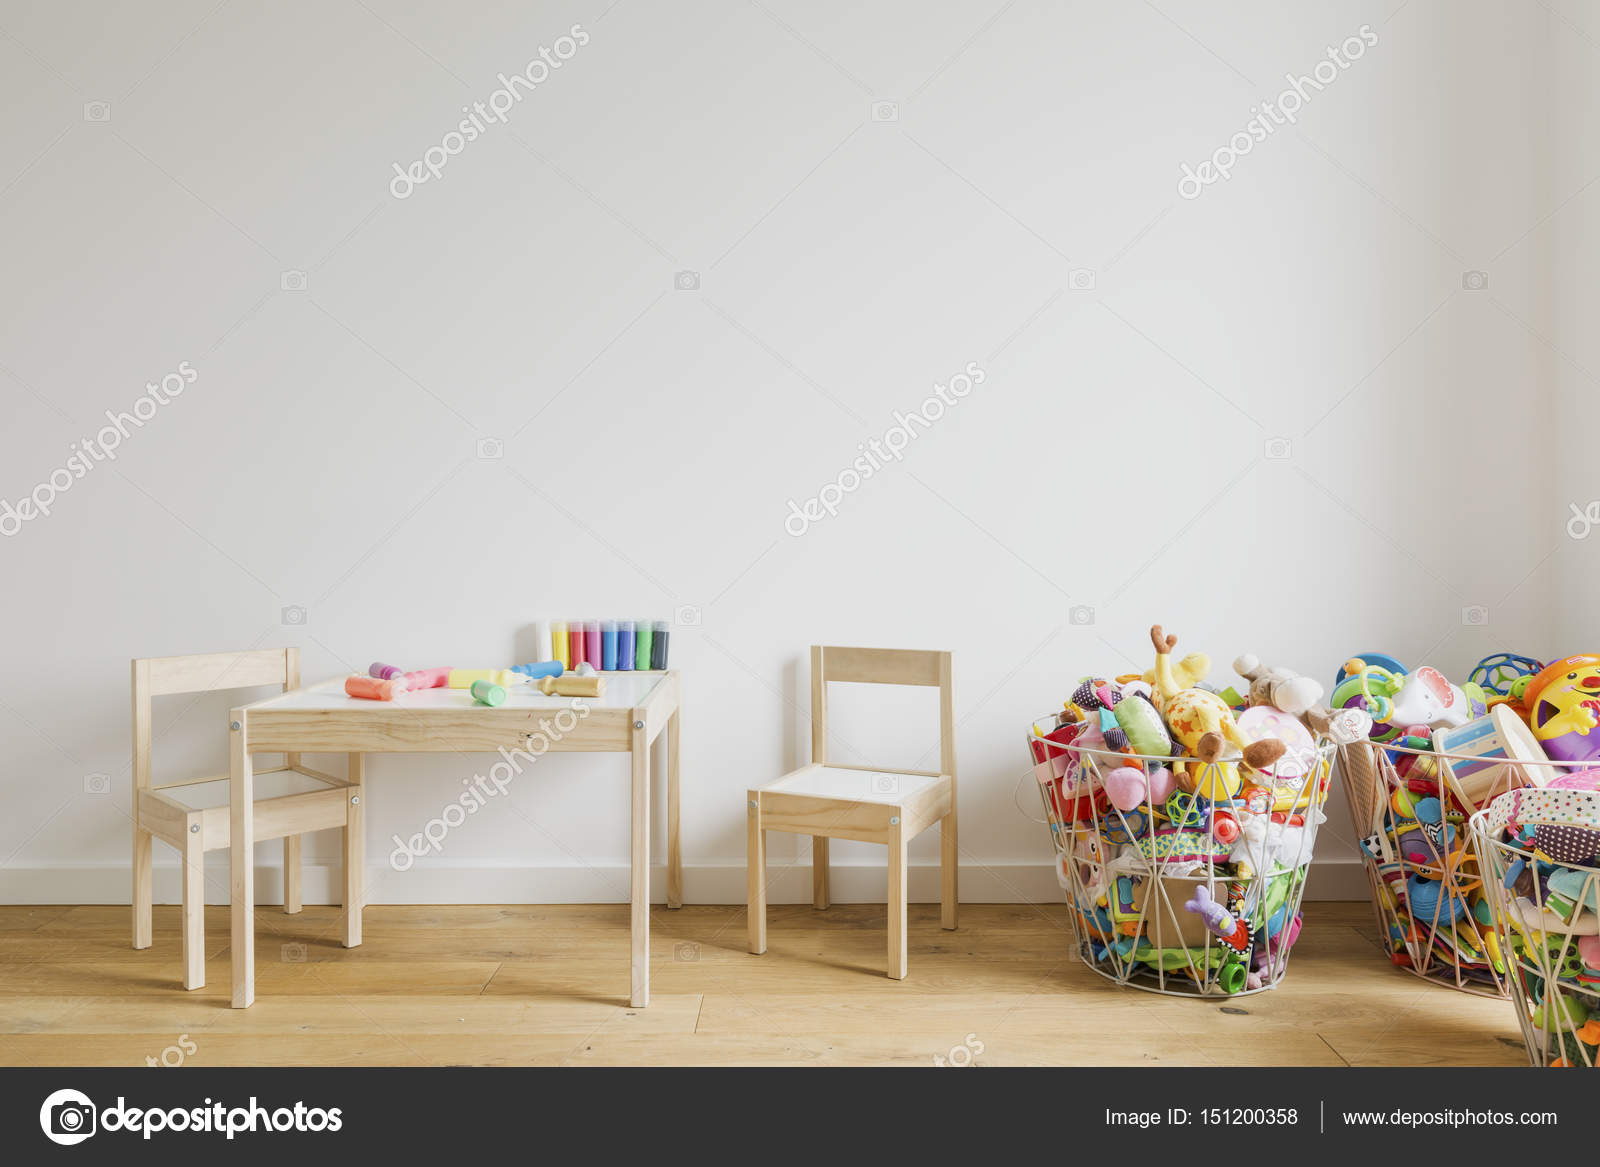 Habitaci N Infantil Con Juguetes Y Muebles Peque Os Foto De  # Muebles Pequenos